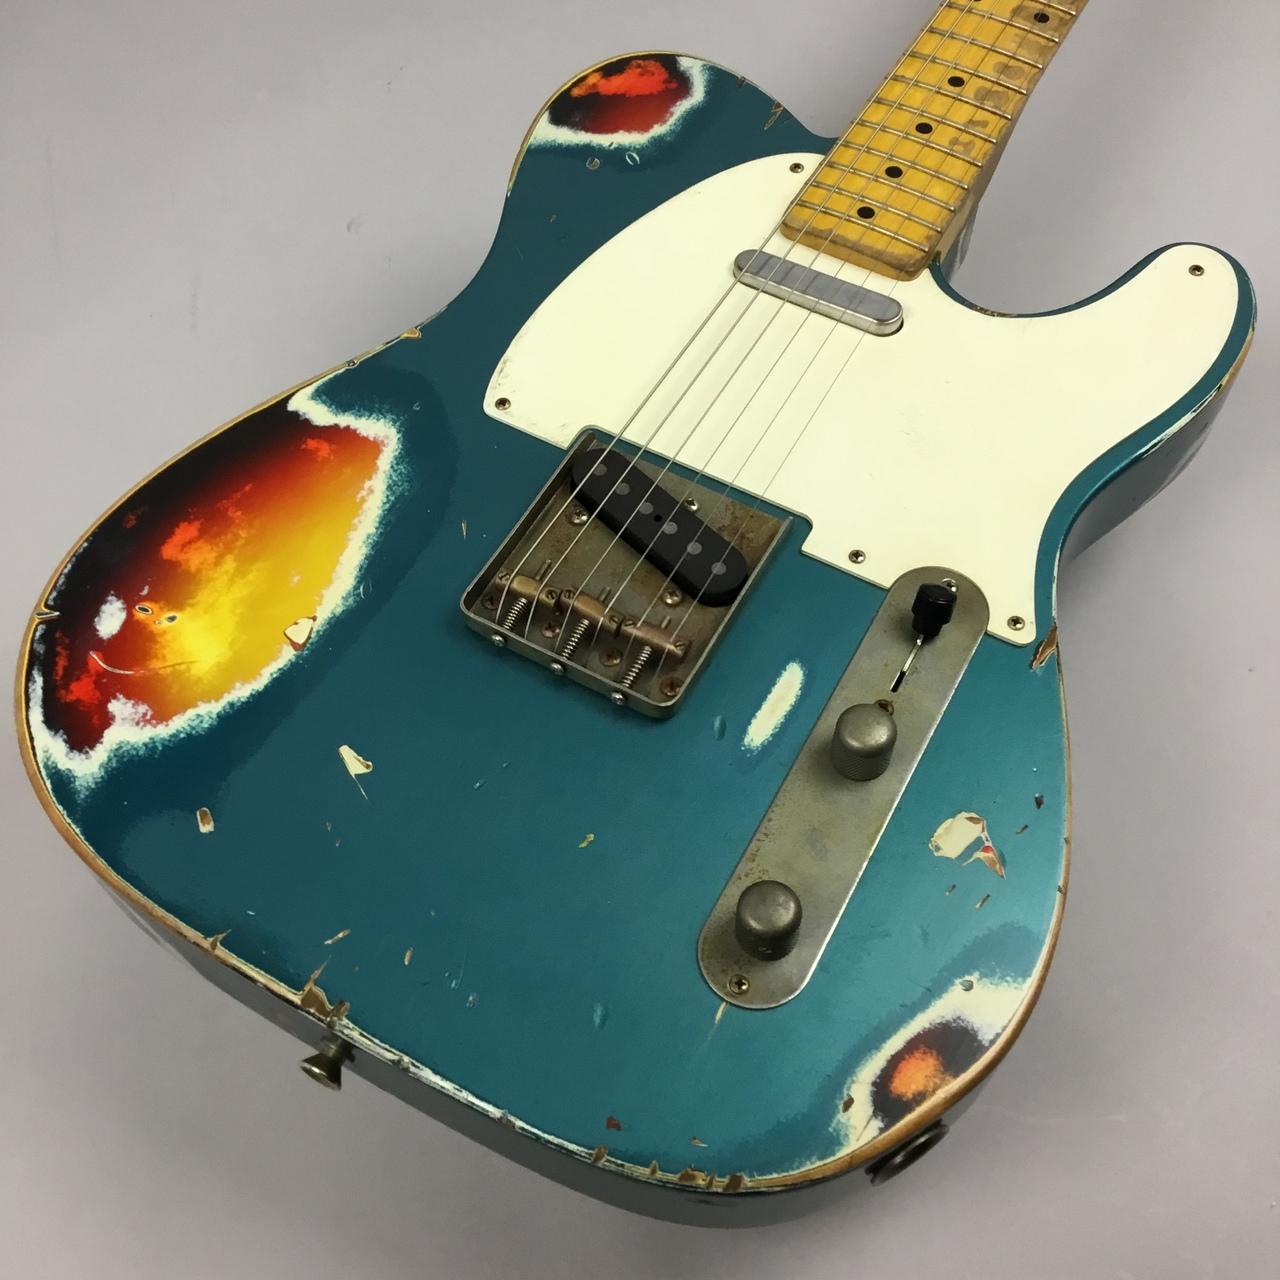 Nash Guitars T-57 Aged Turquoise Over 3ToneSB